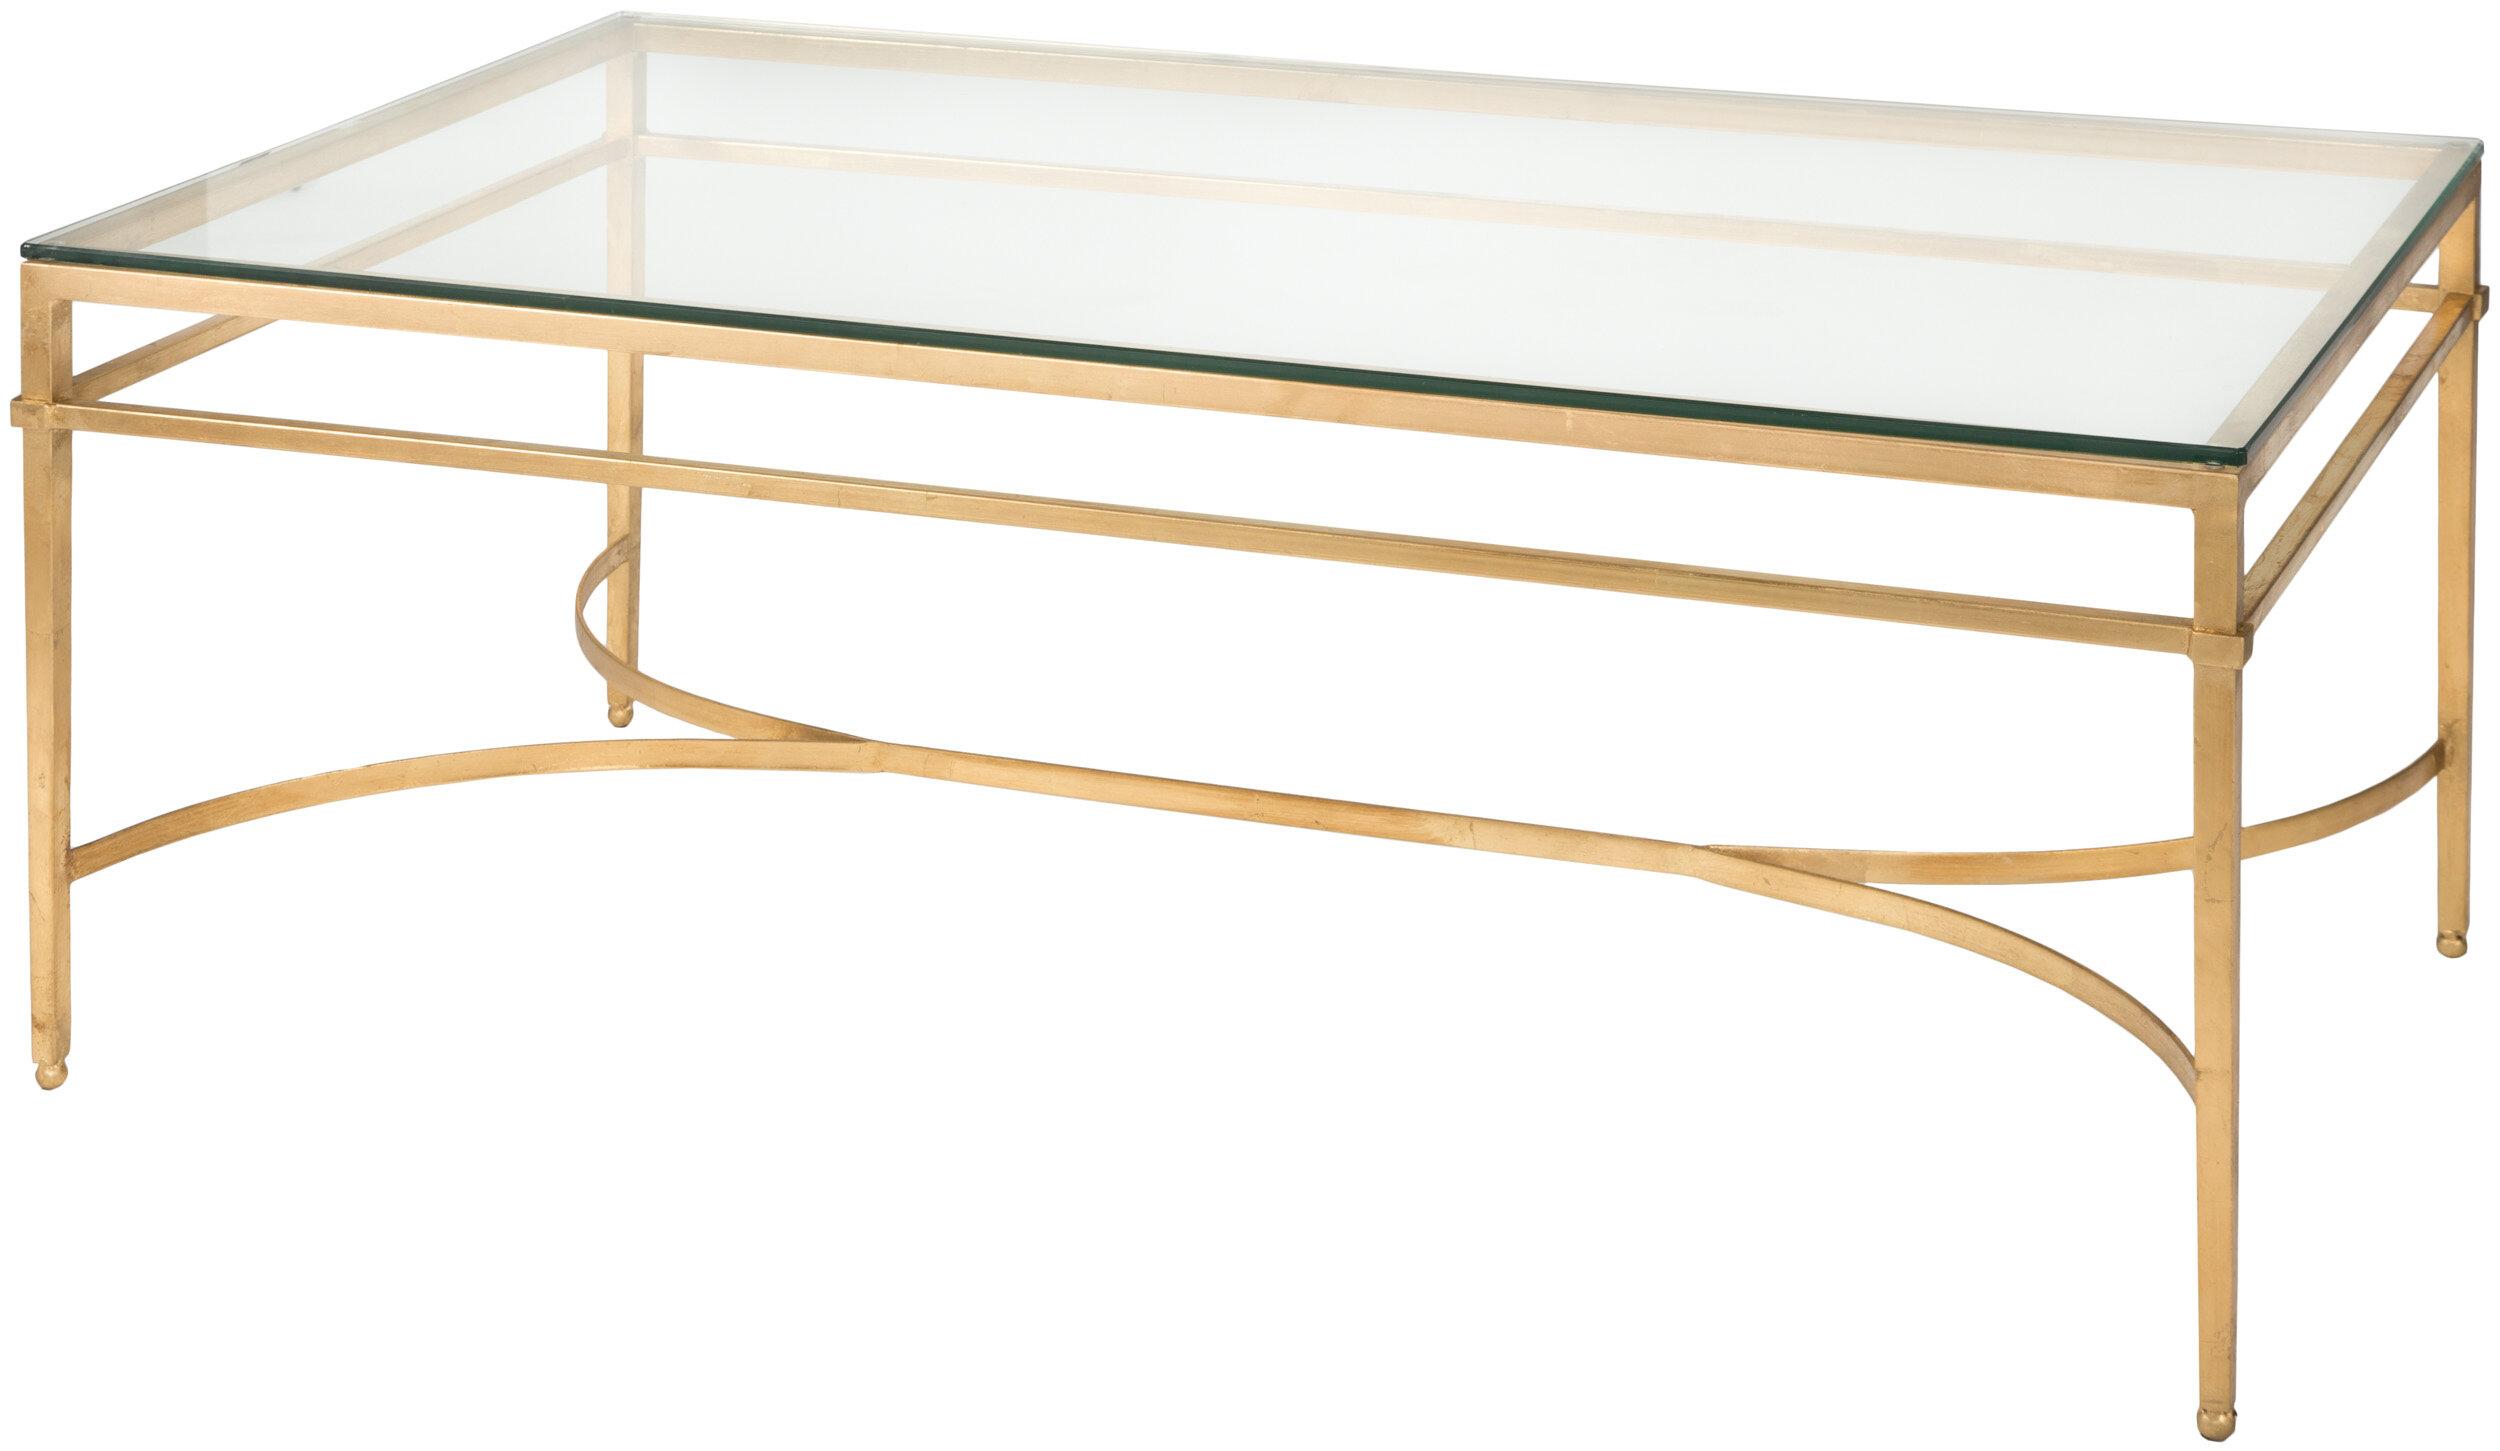 Willa Arlo Interiors Reynaldo Rectangle Glass Top Coffee Table